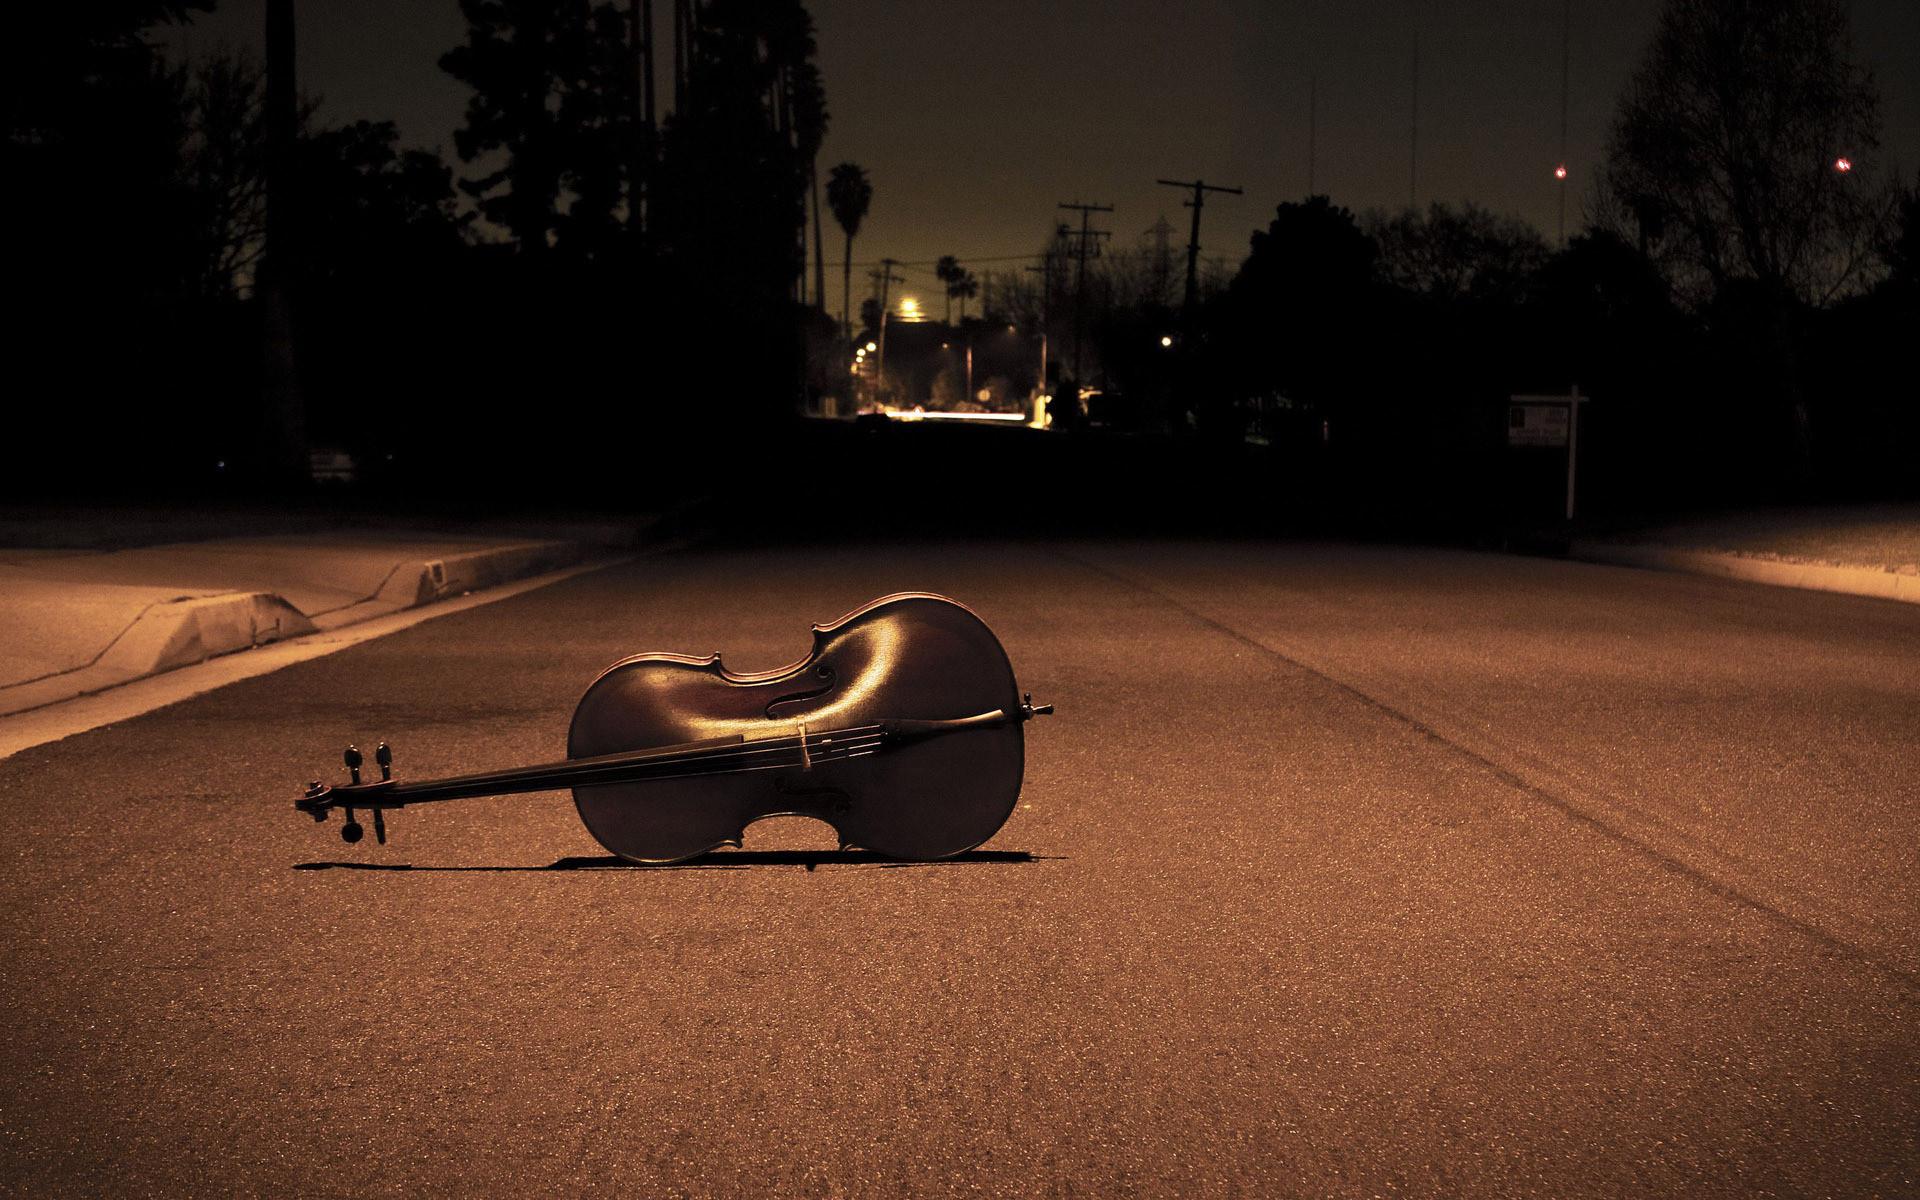 … Violin on the street HD Wallpaper 1920×1200